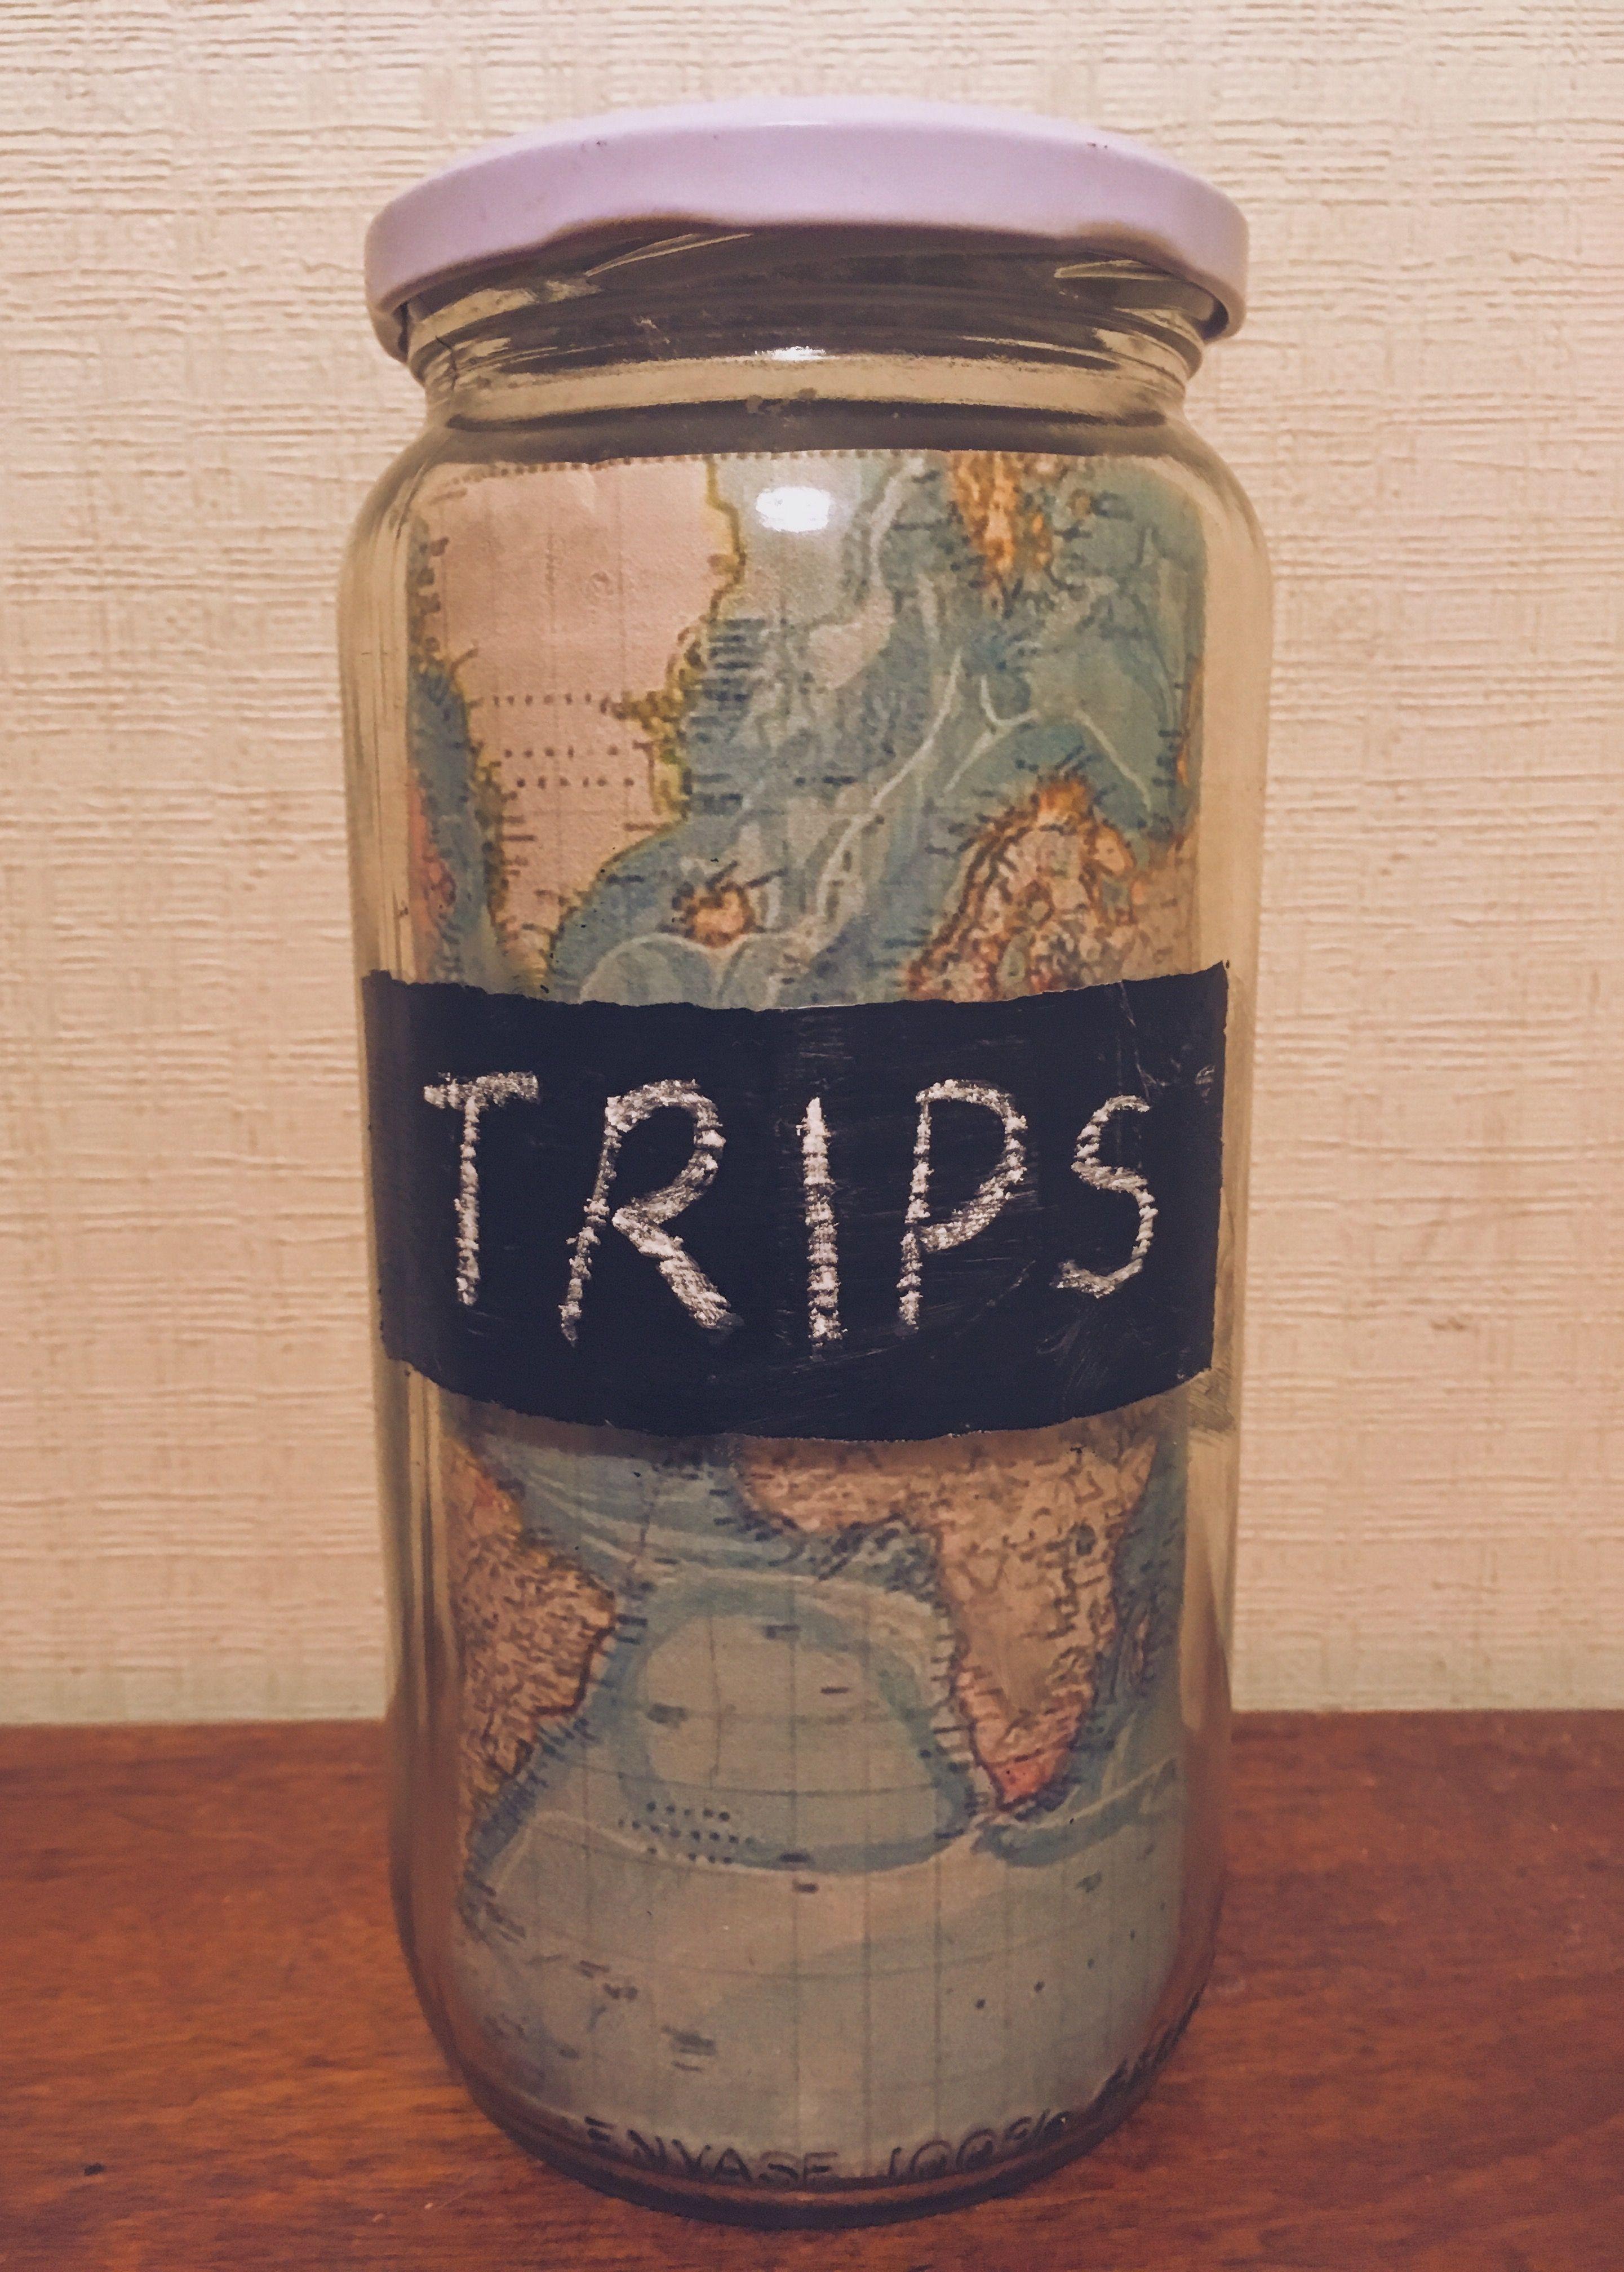 Saving Money For Future Trips Diy Piggybank Moneysave Jar Trips Map Travel Moneysaving Masonjar Chalkboardpain Savings Jar Diy And Crafts Mason Jars